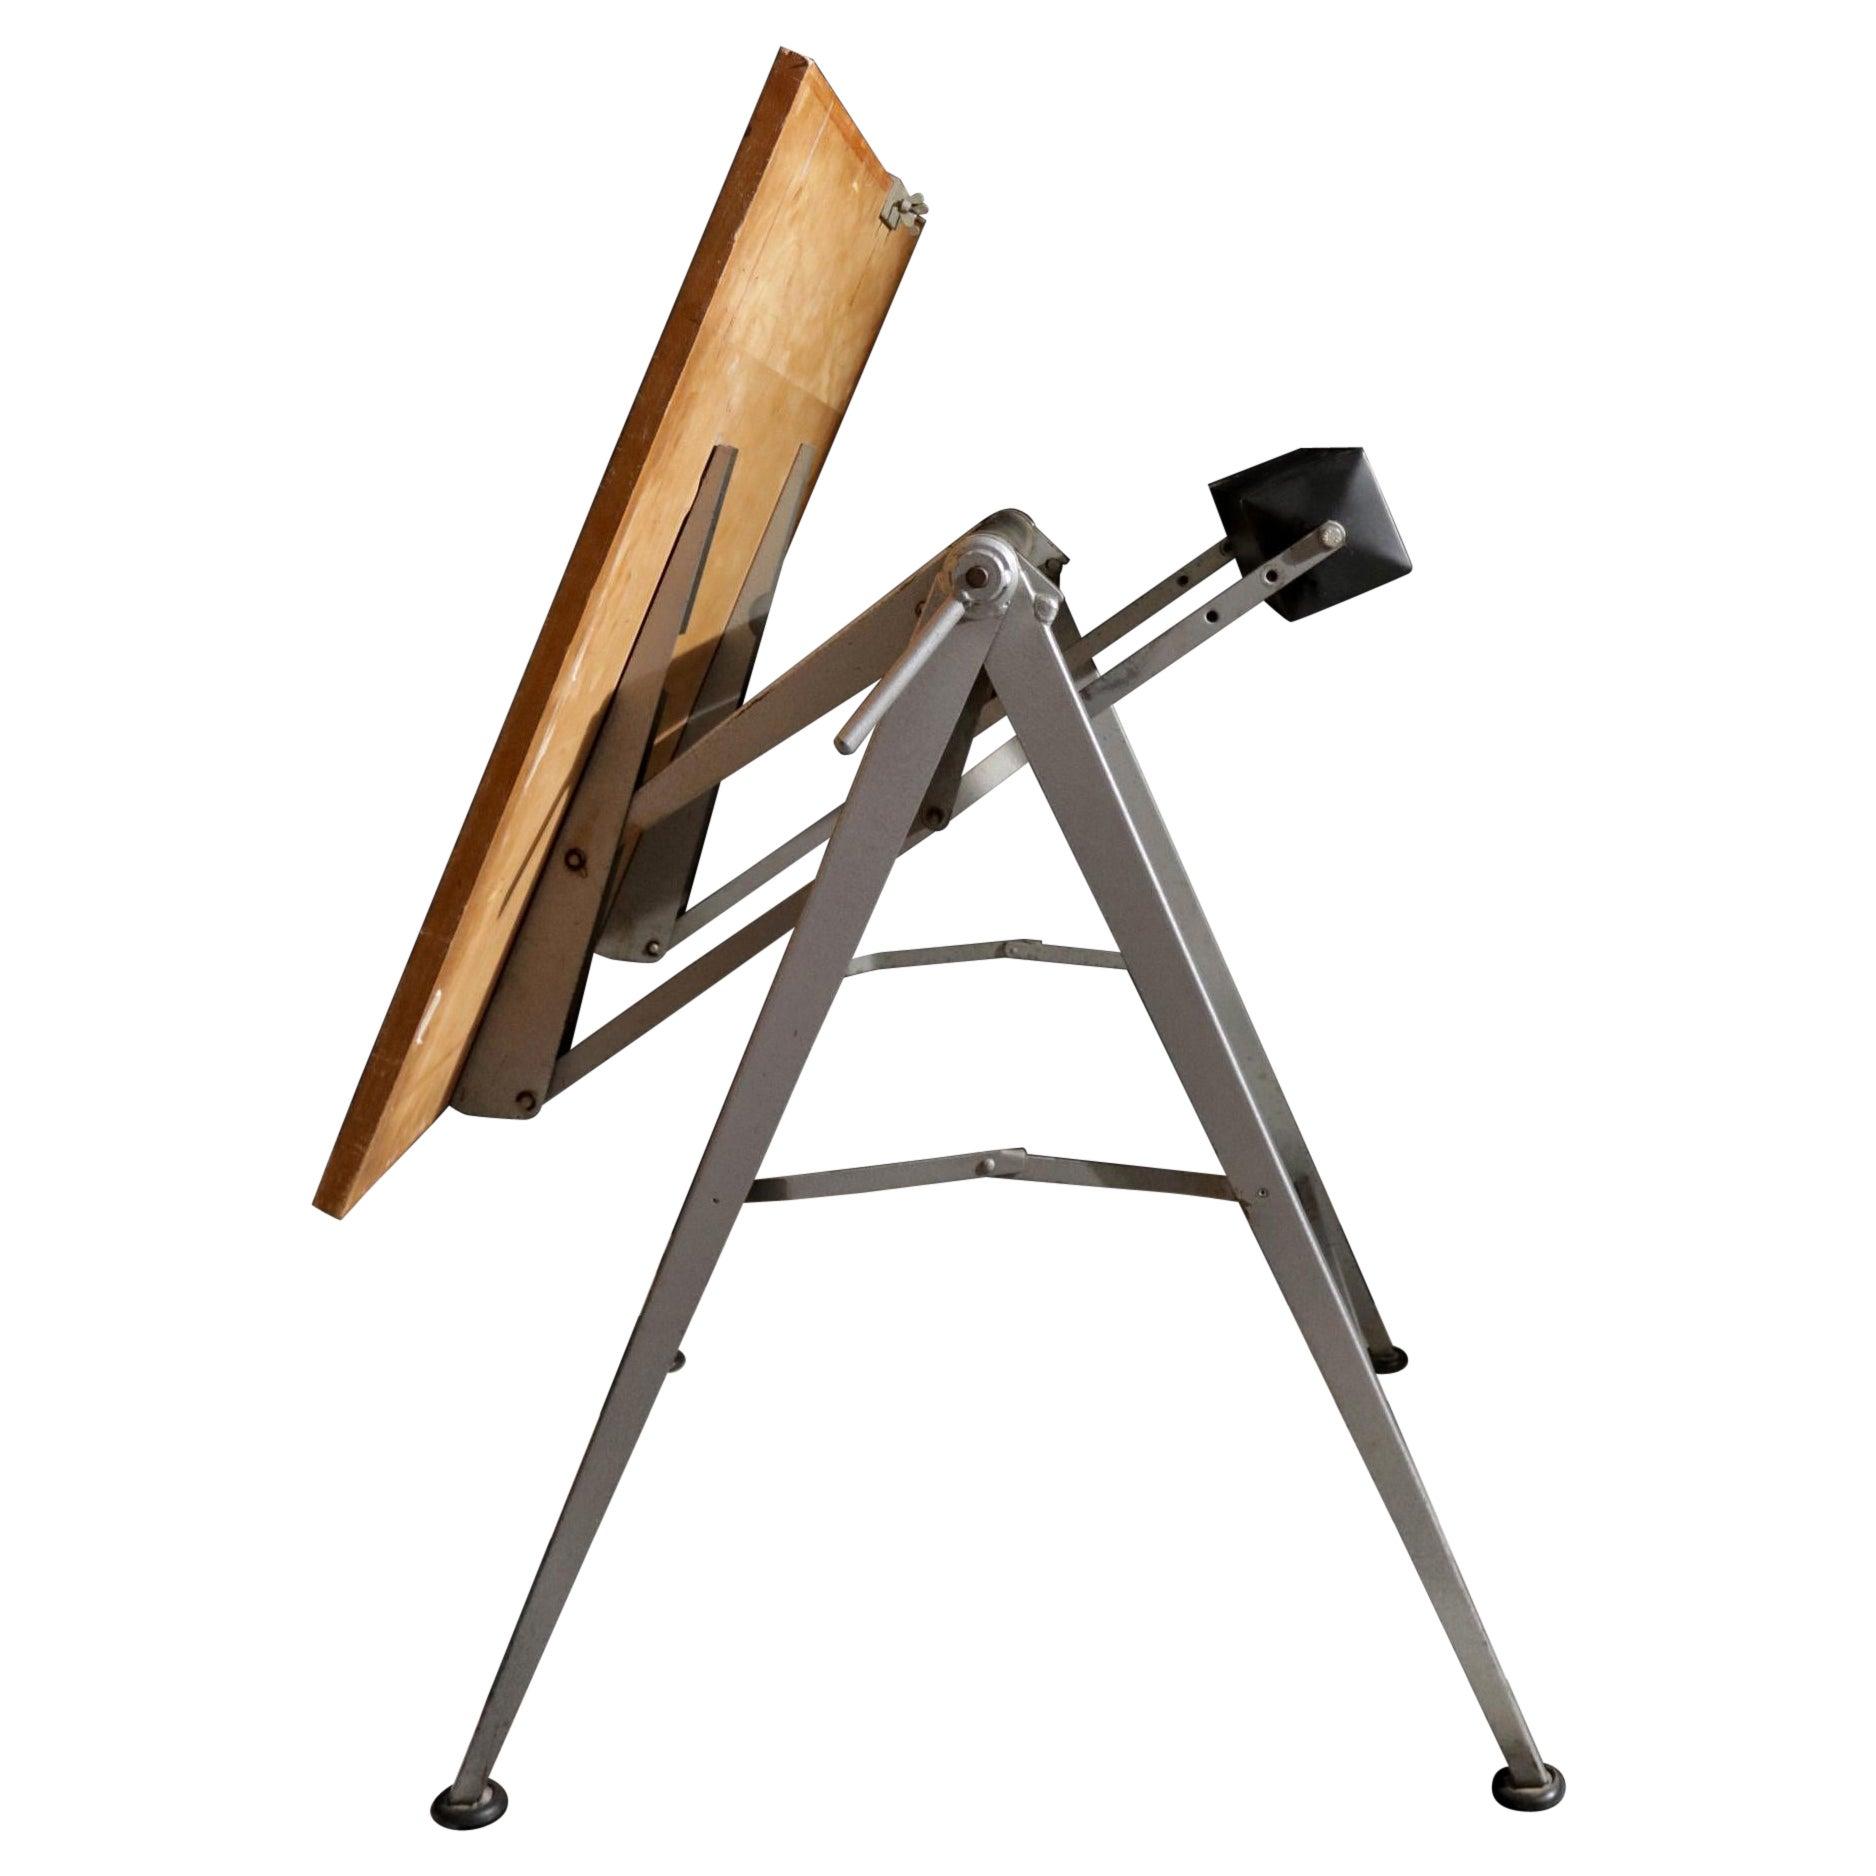 Mid-century Dutch Industrial Design Architect Folding Drafting Table 50